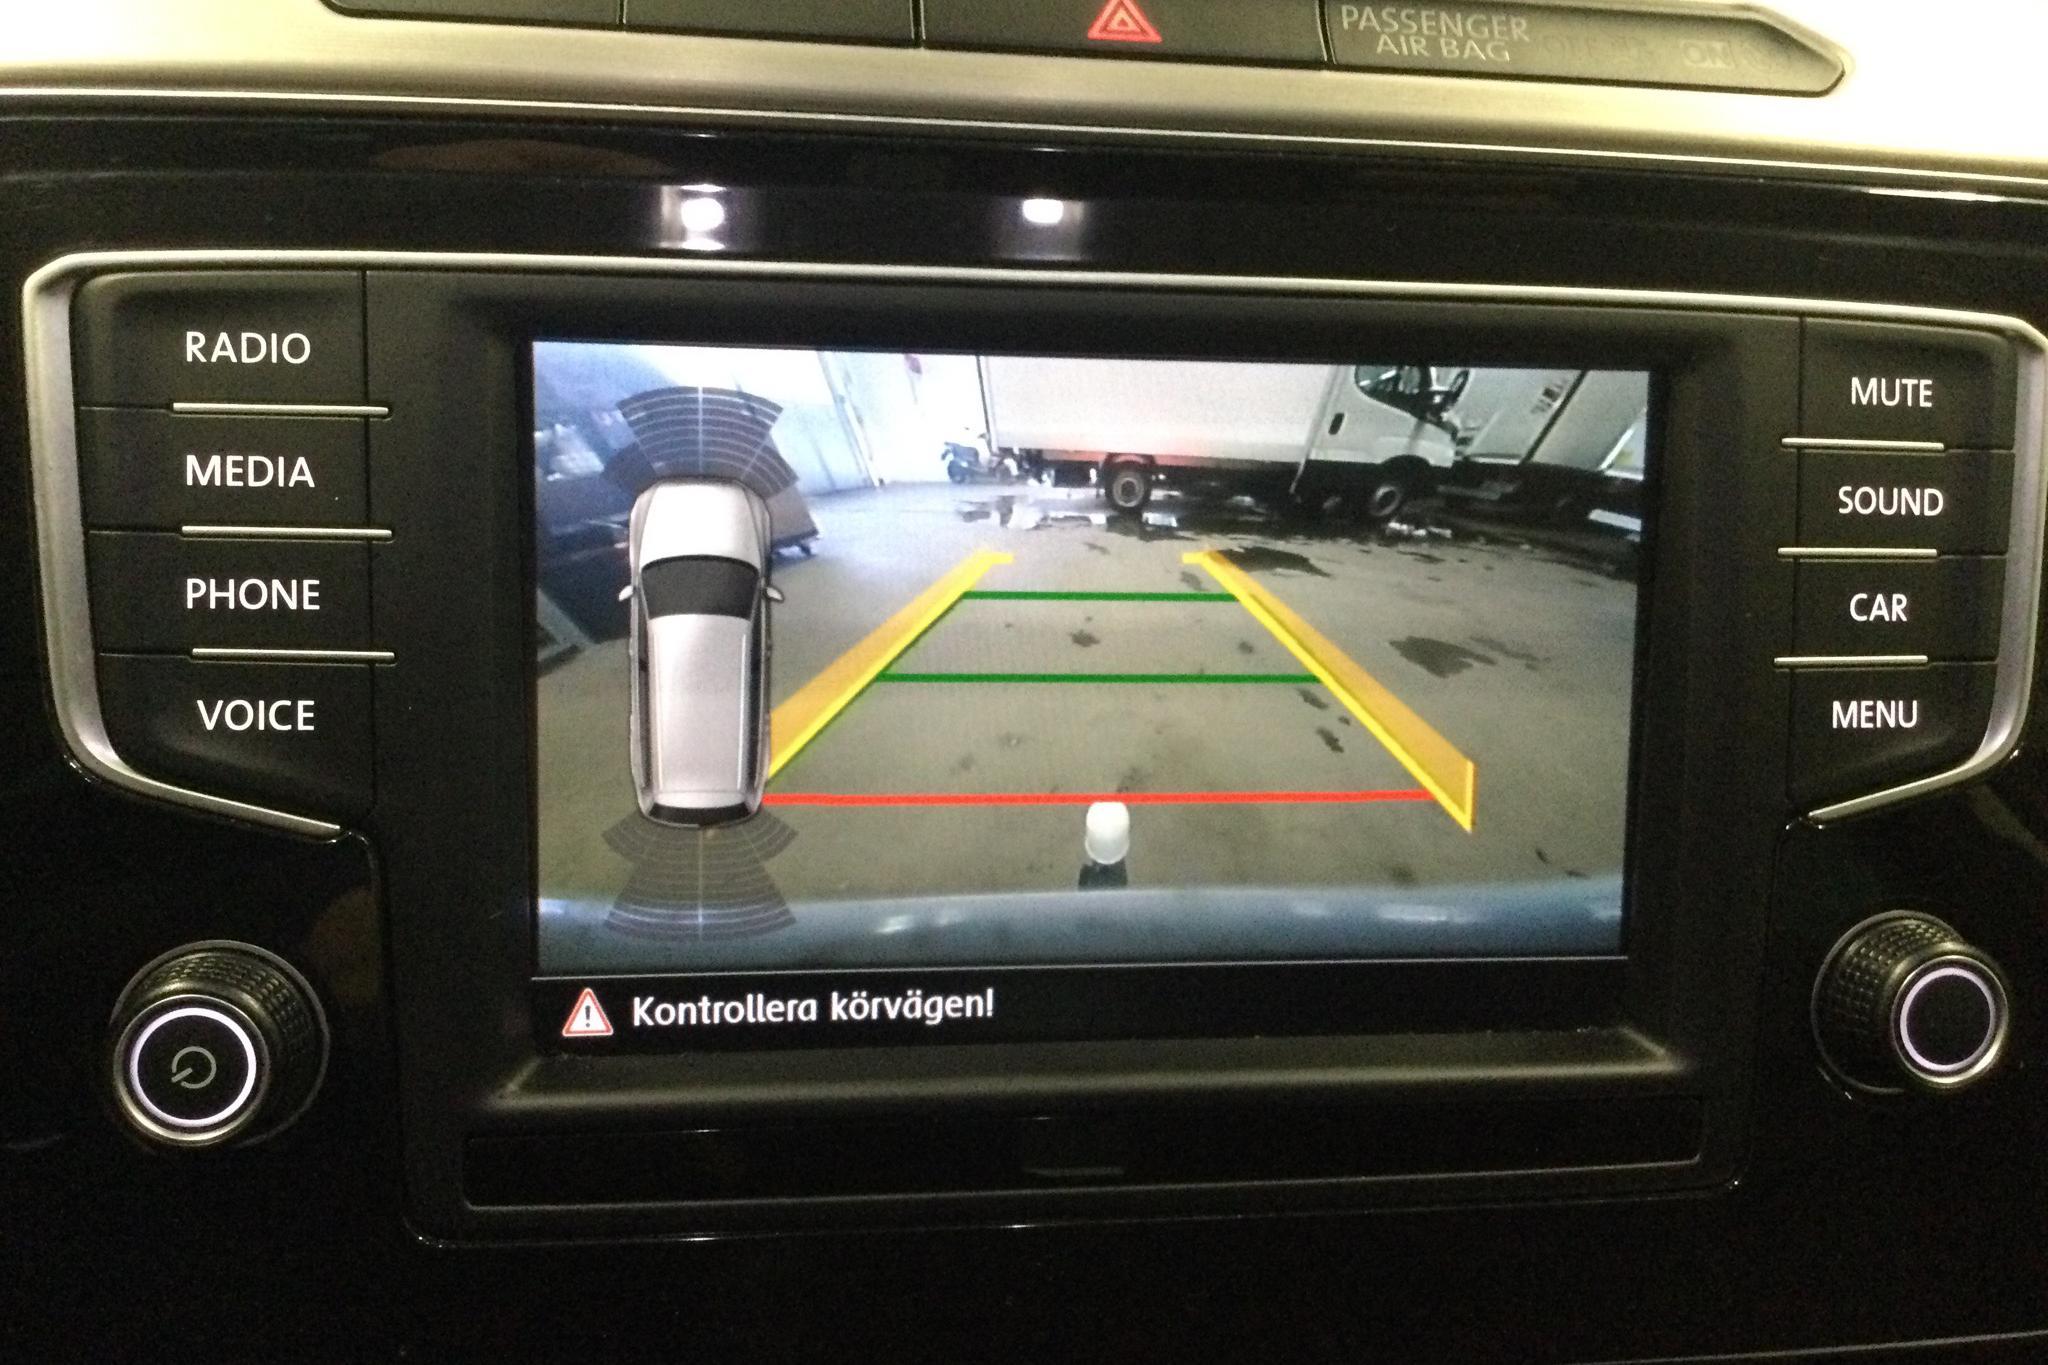 VW Passat 2.0 TDI Sportscombi 4MOTION (190hk) - 69 600 km - Automatic - white - 2017